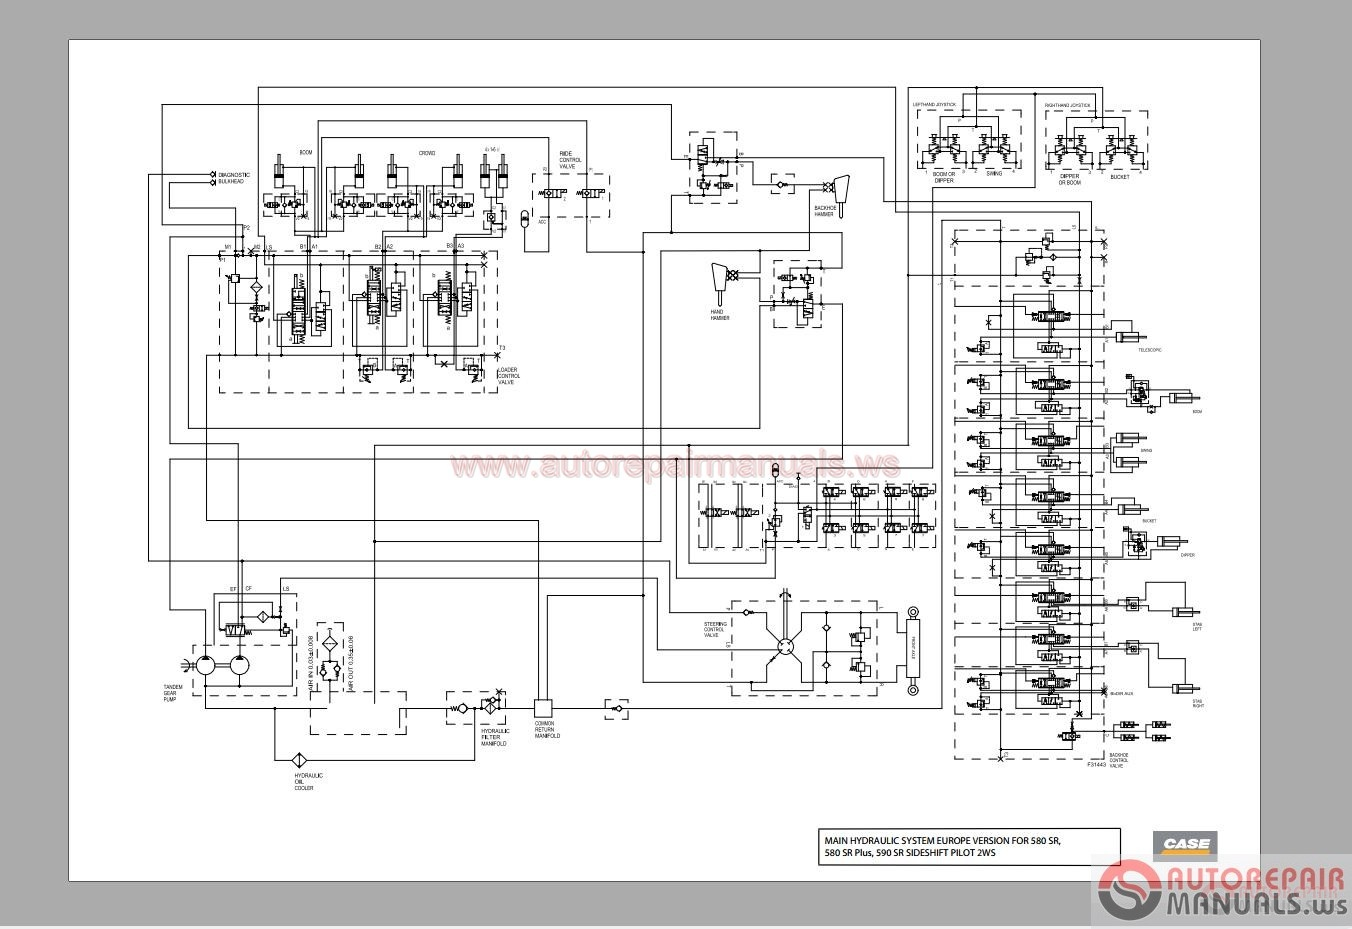 KA_0924] 1998 Case 580 Super L Wiring Diagram Free Diagram | 1998 Case 580 Super L Wiring Diagram |  | Sianu Aidew Illuminateatx Librar Wiring 101